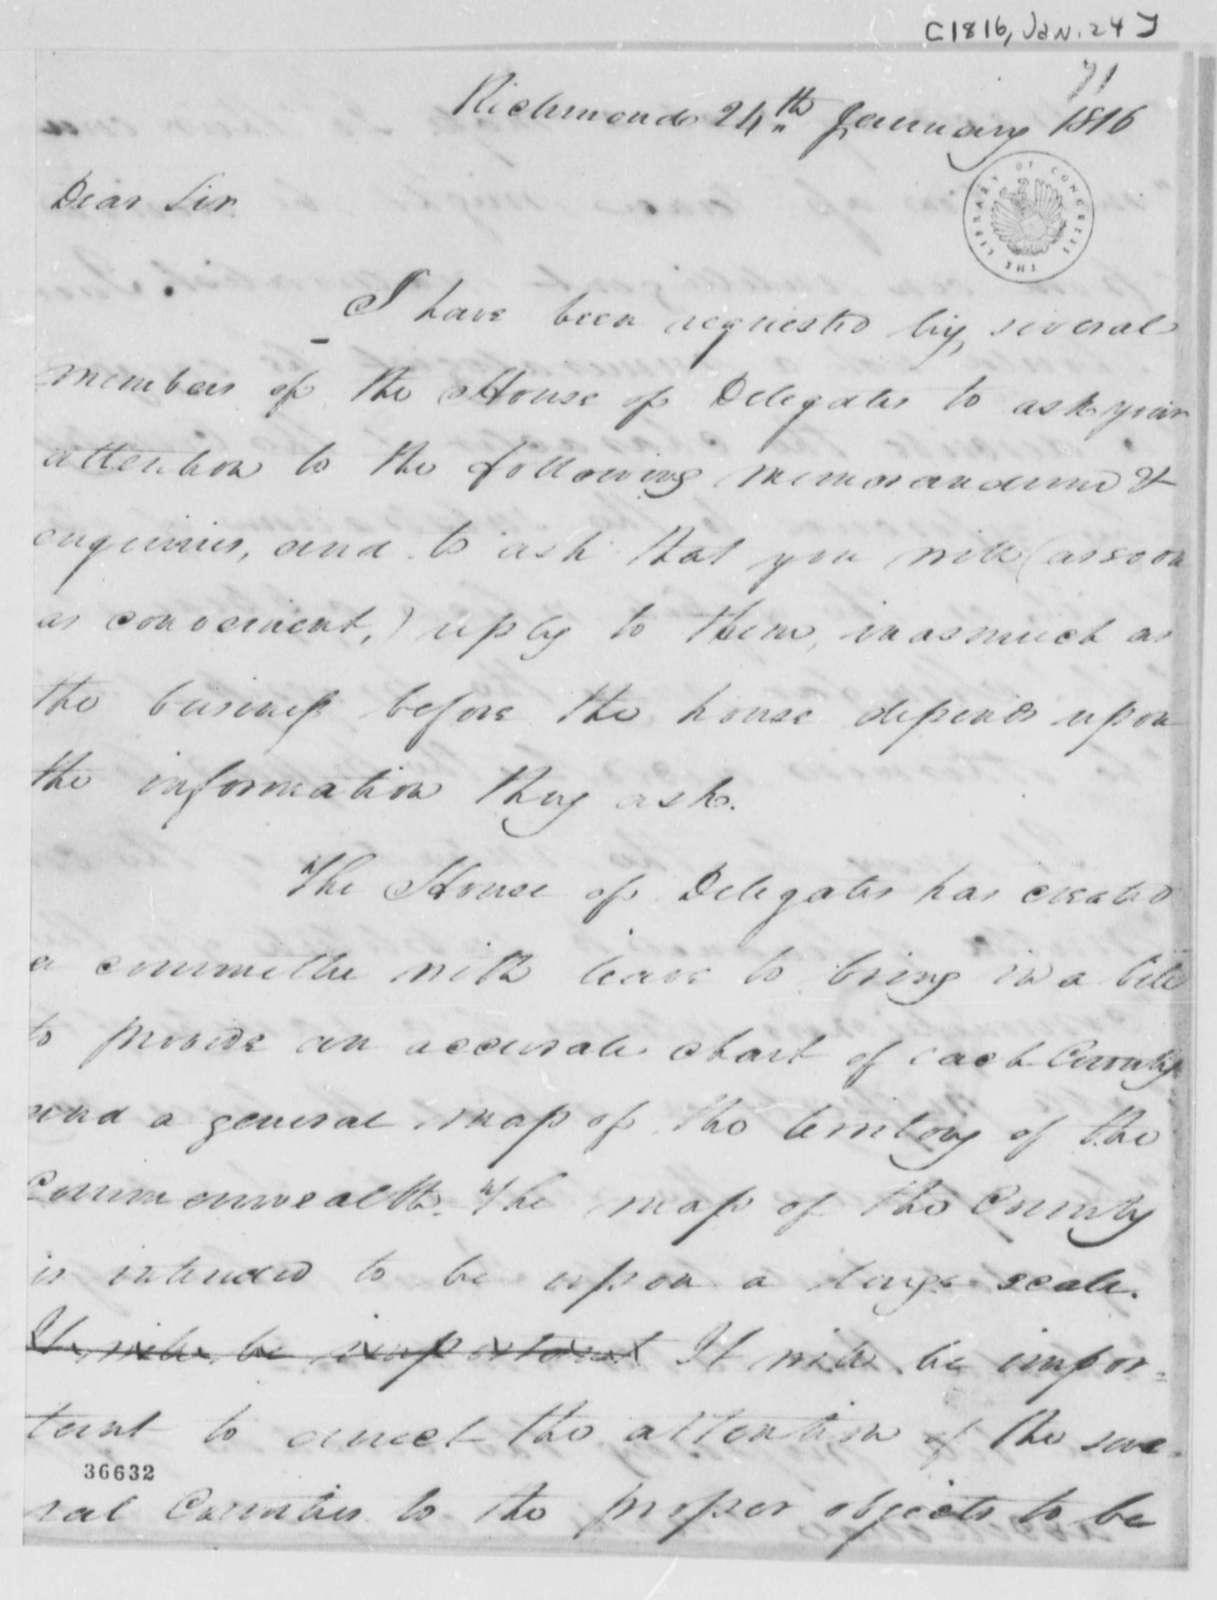 Thomas Walker Maury to Thomas Jefferson, January 24, 1816